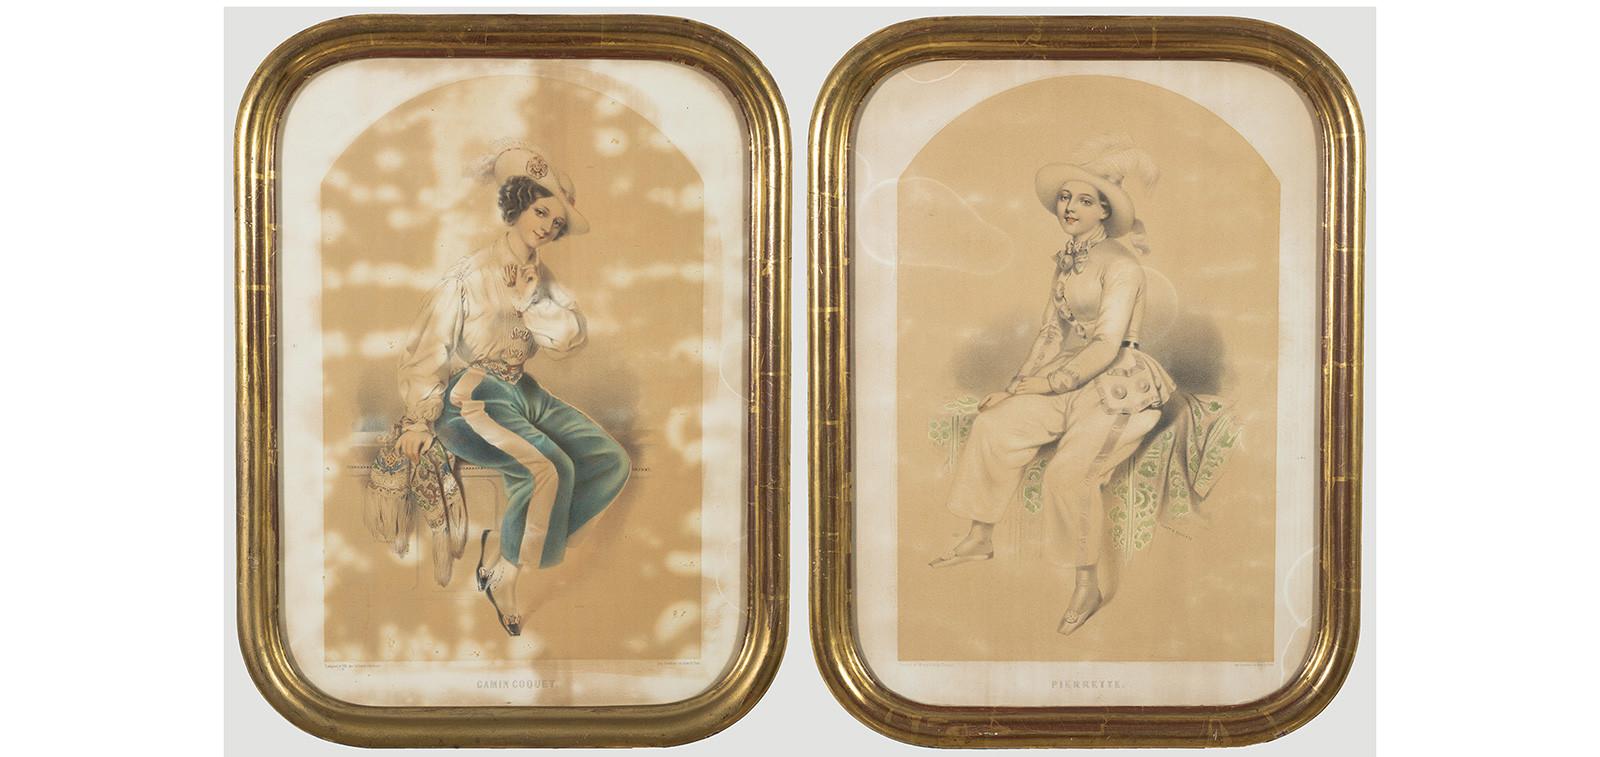 Célestin Deshays (n. 1817–1896): Gamin coquet, s.a. ja Pierrette, s.a.